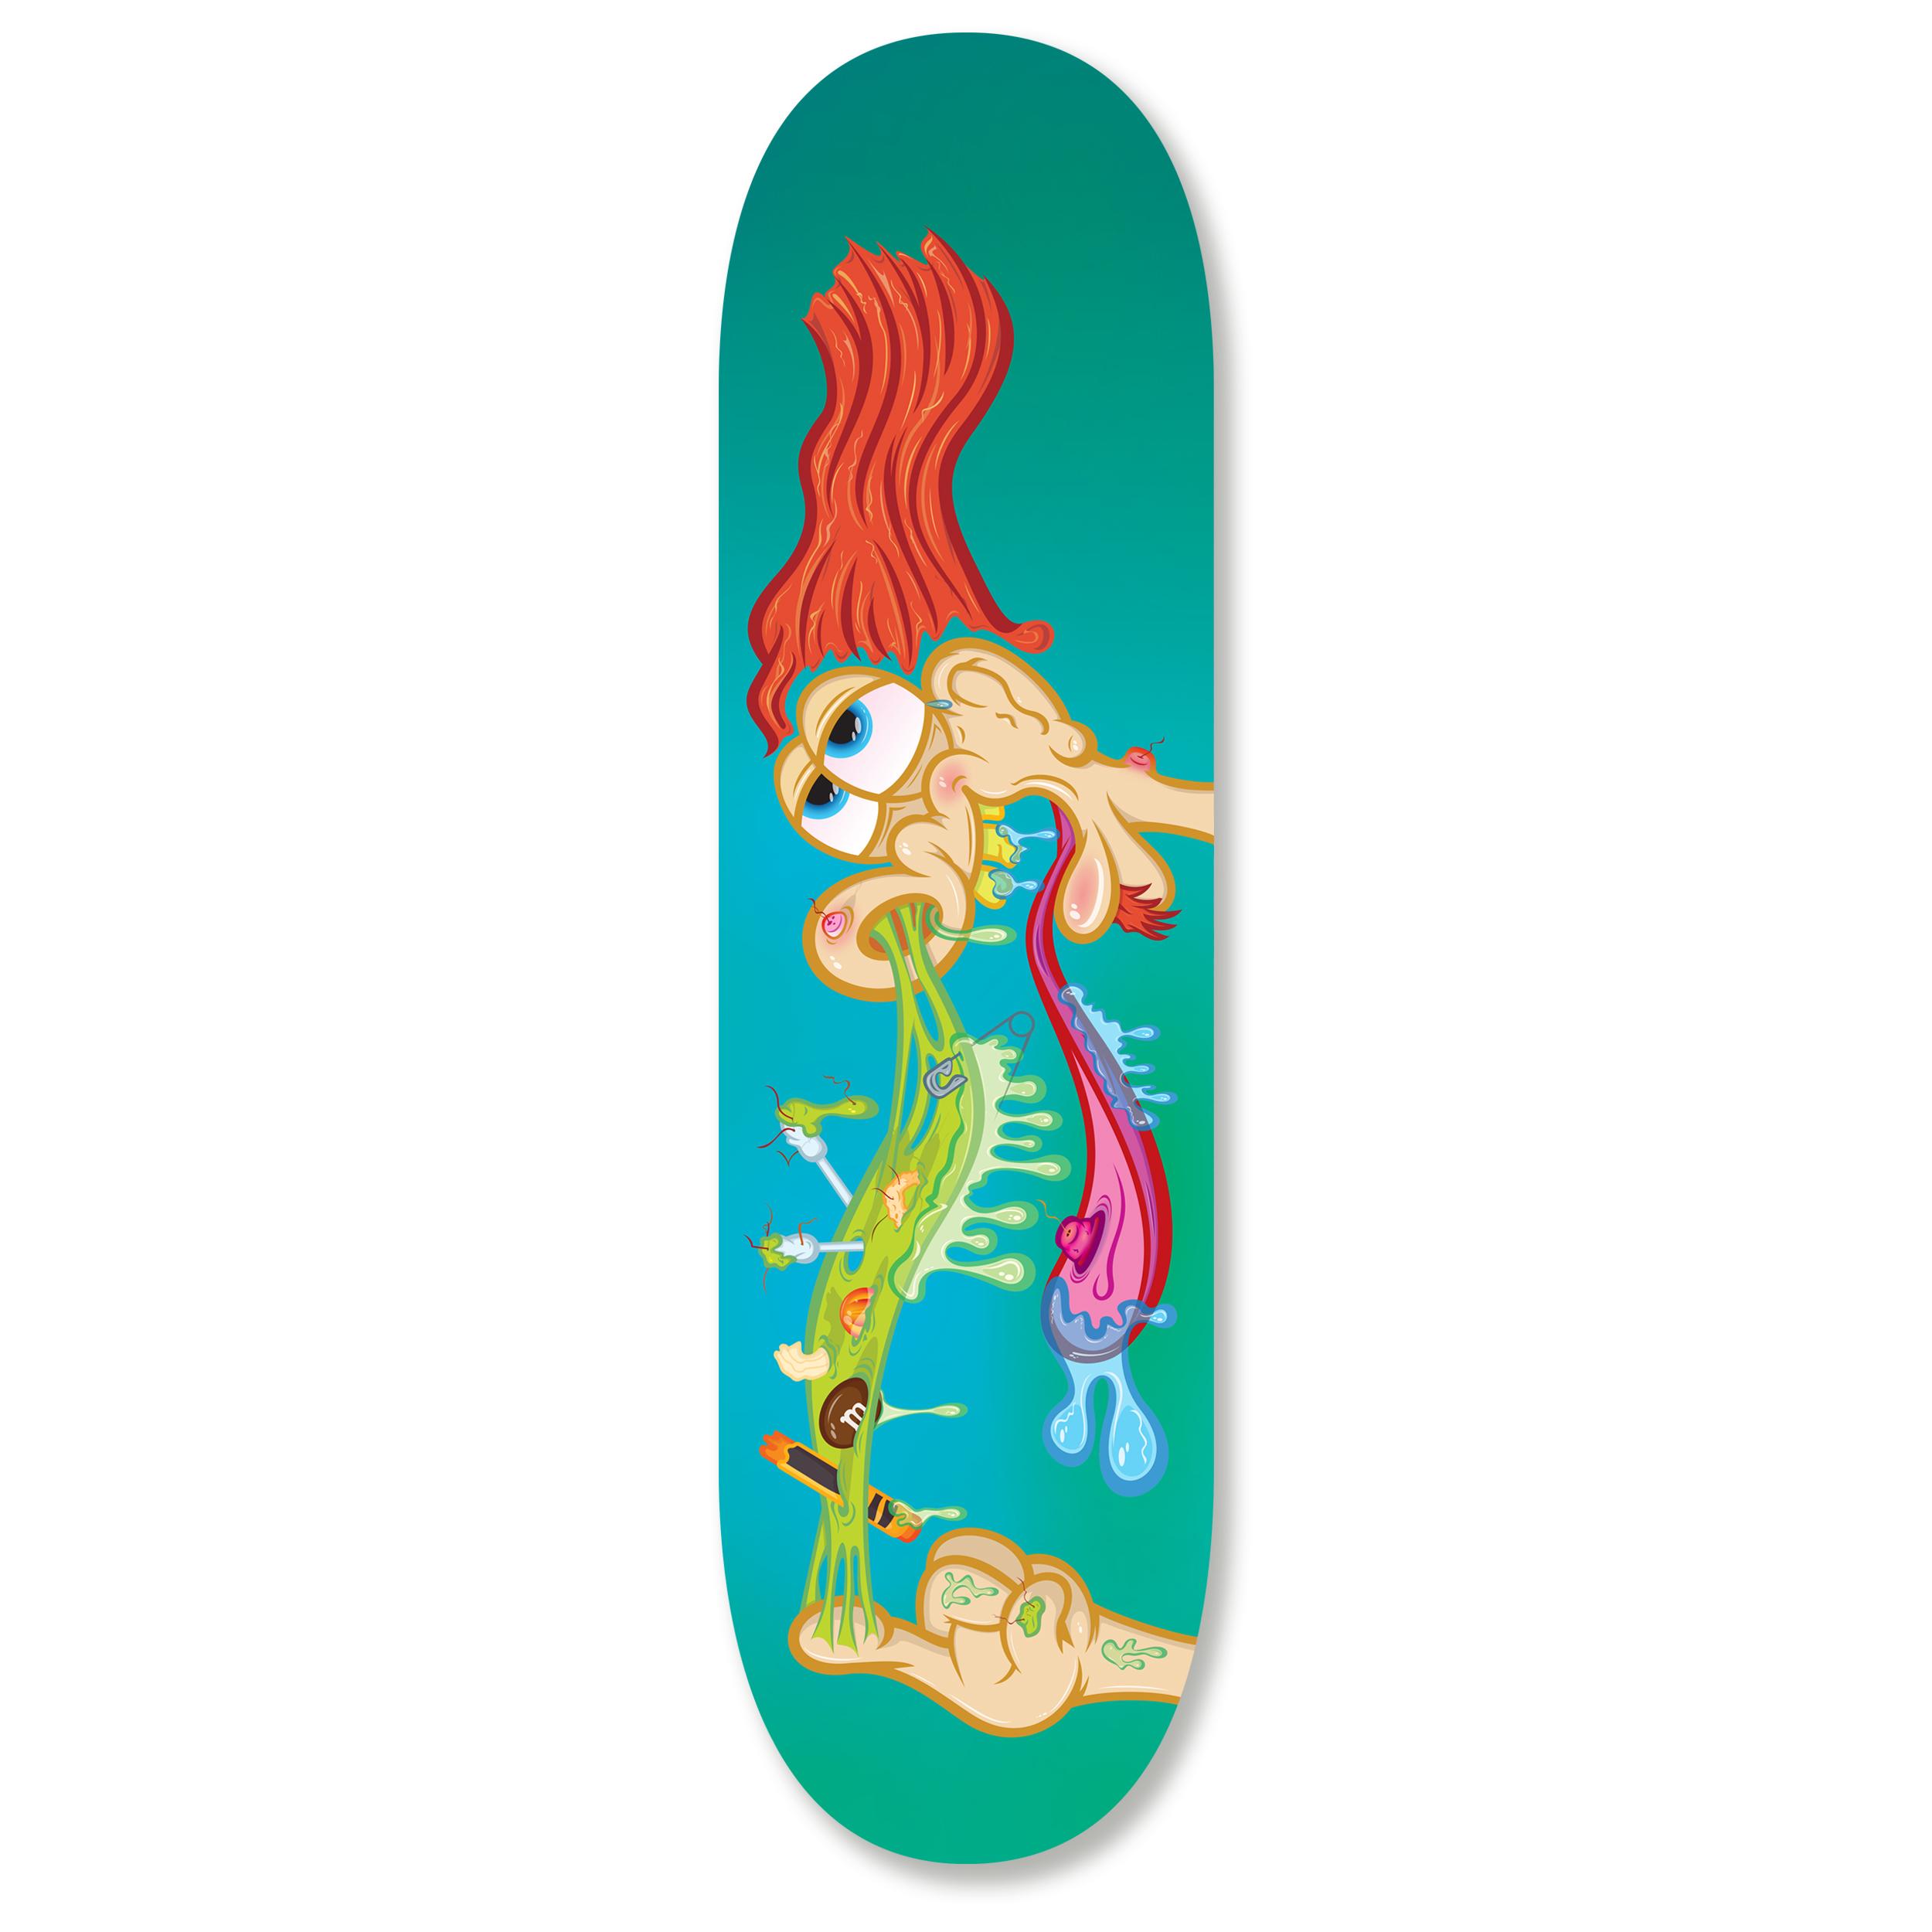 skateboard-deck-gone-fishin-02.jpg